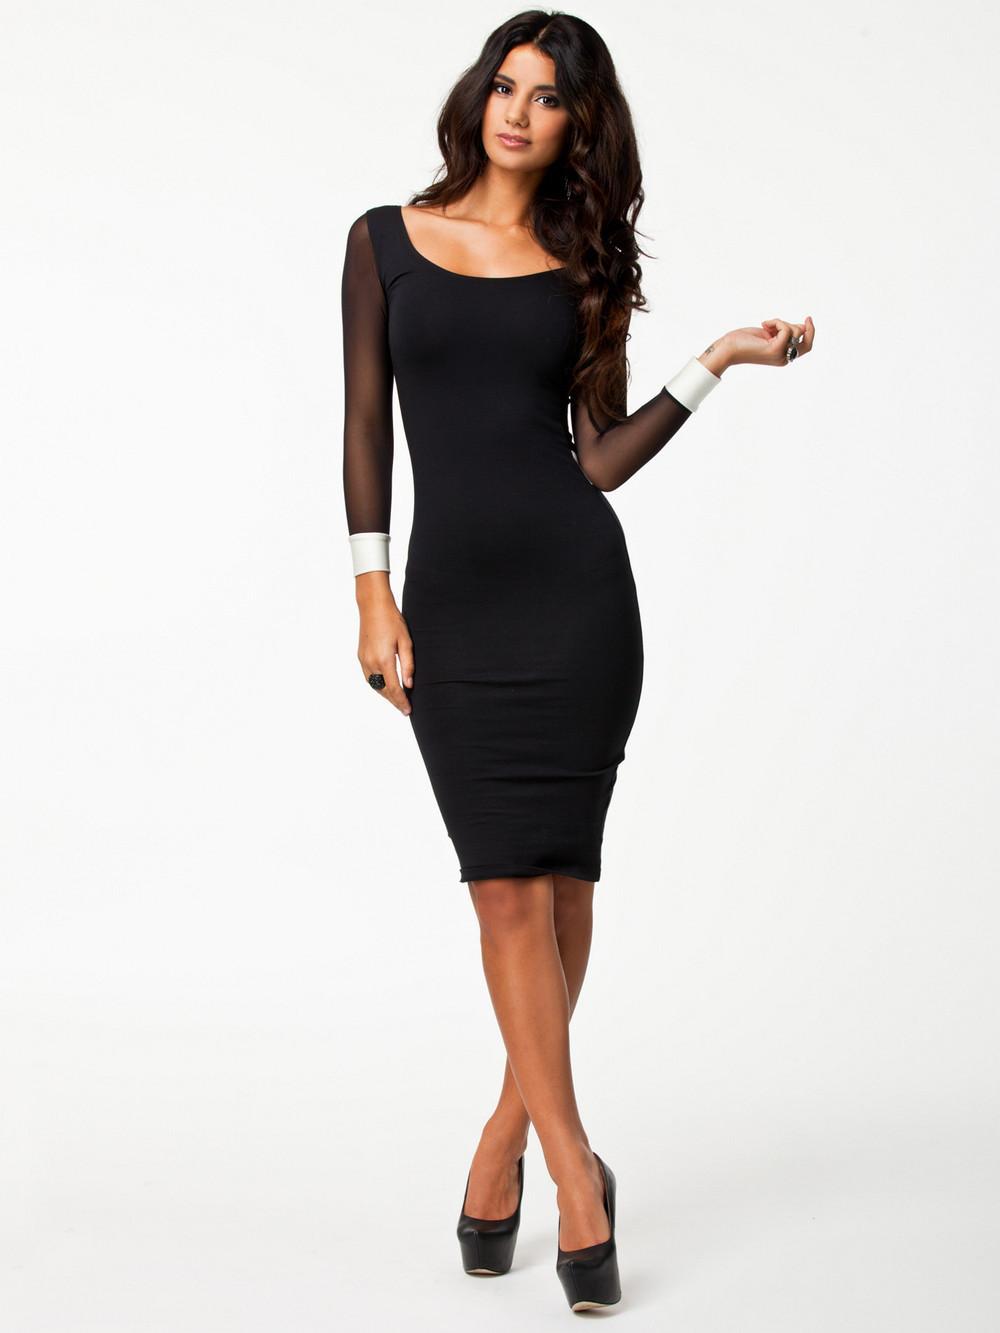 Long Tight Dresses